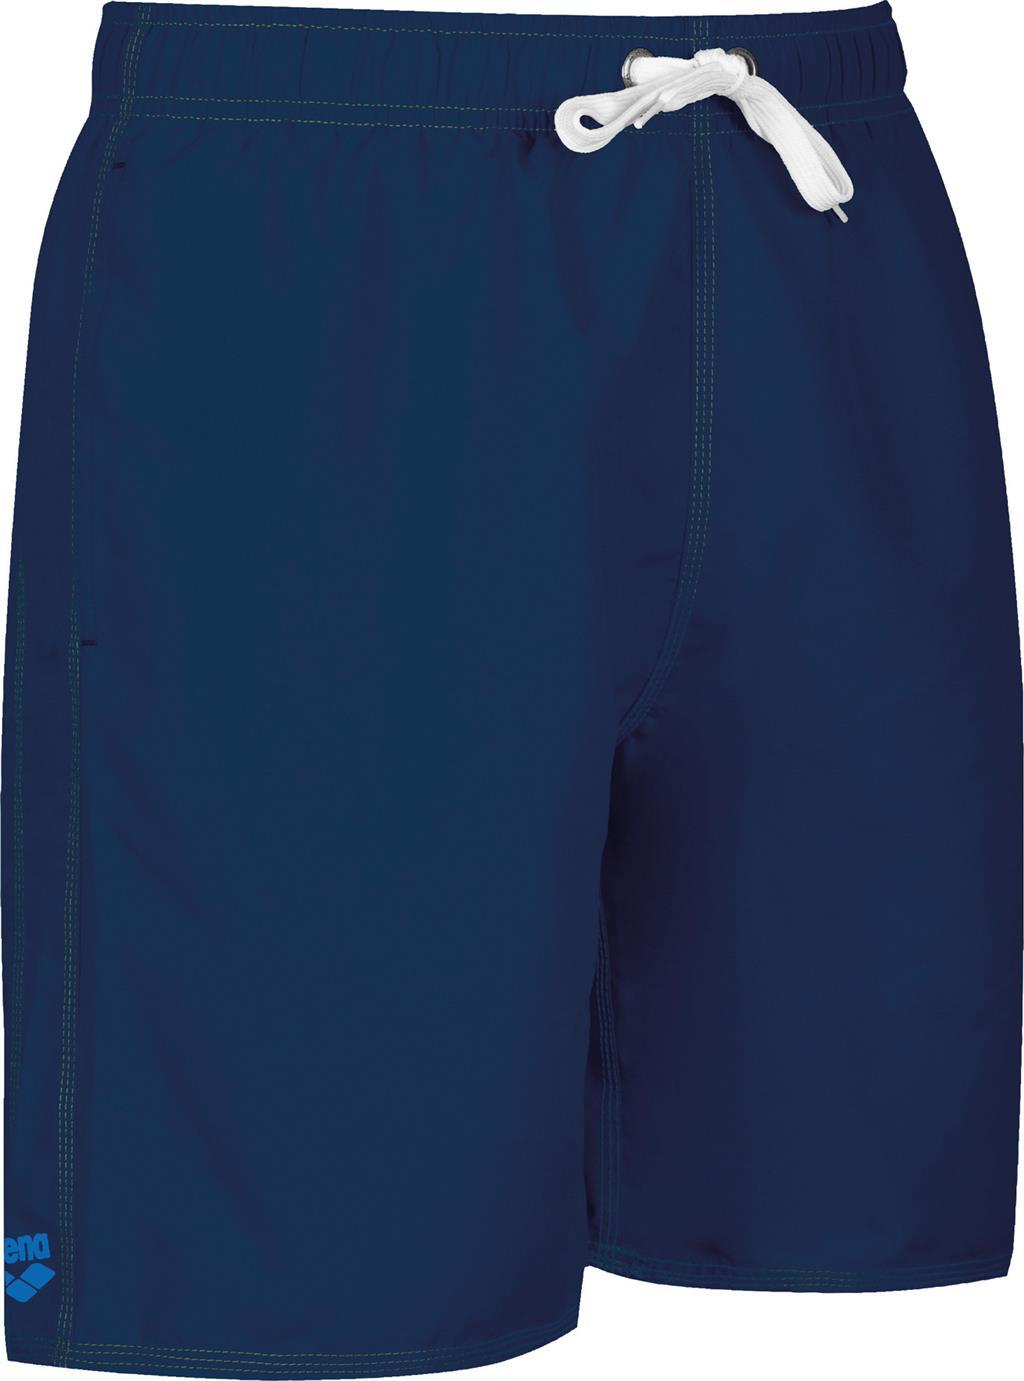 ARENA BADESHORT BOXER    NAVY/PIX BLUE